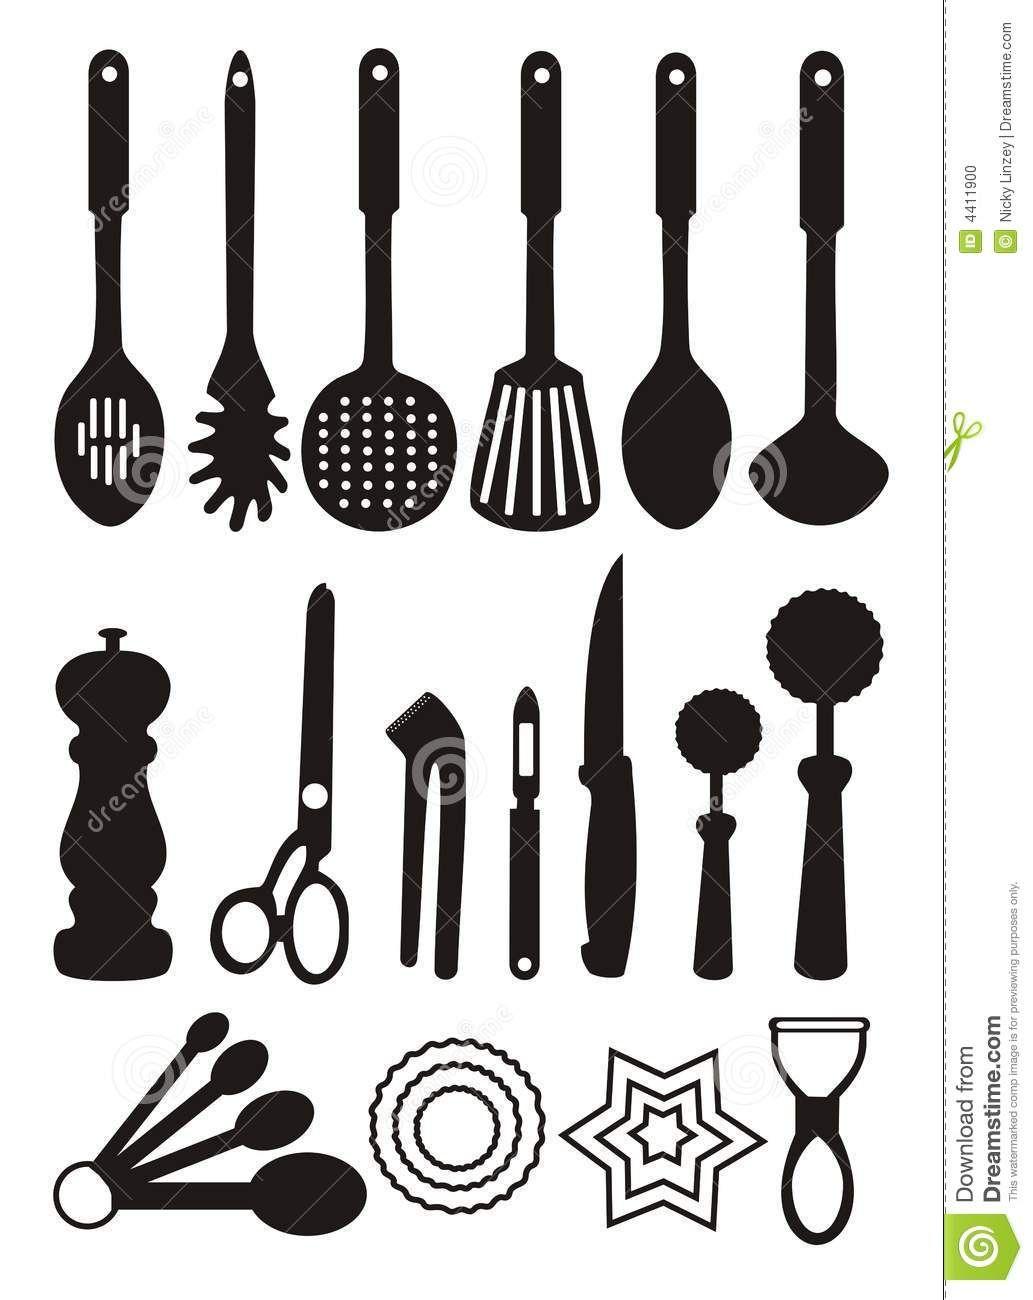 Kitchen Utensils Art kitchen tools clip art - free large images | baby | pinterest